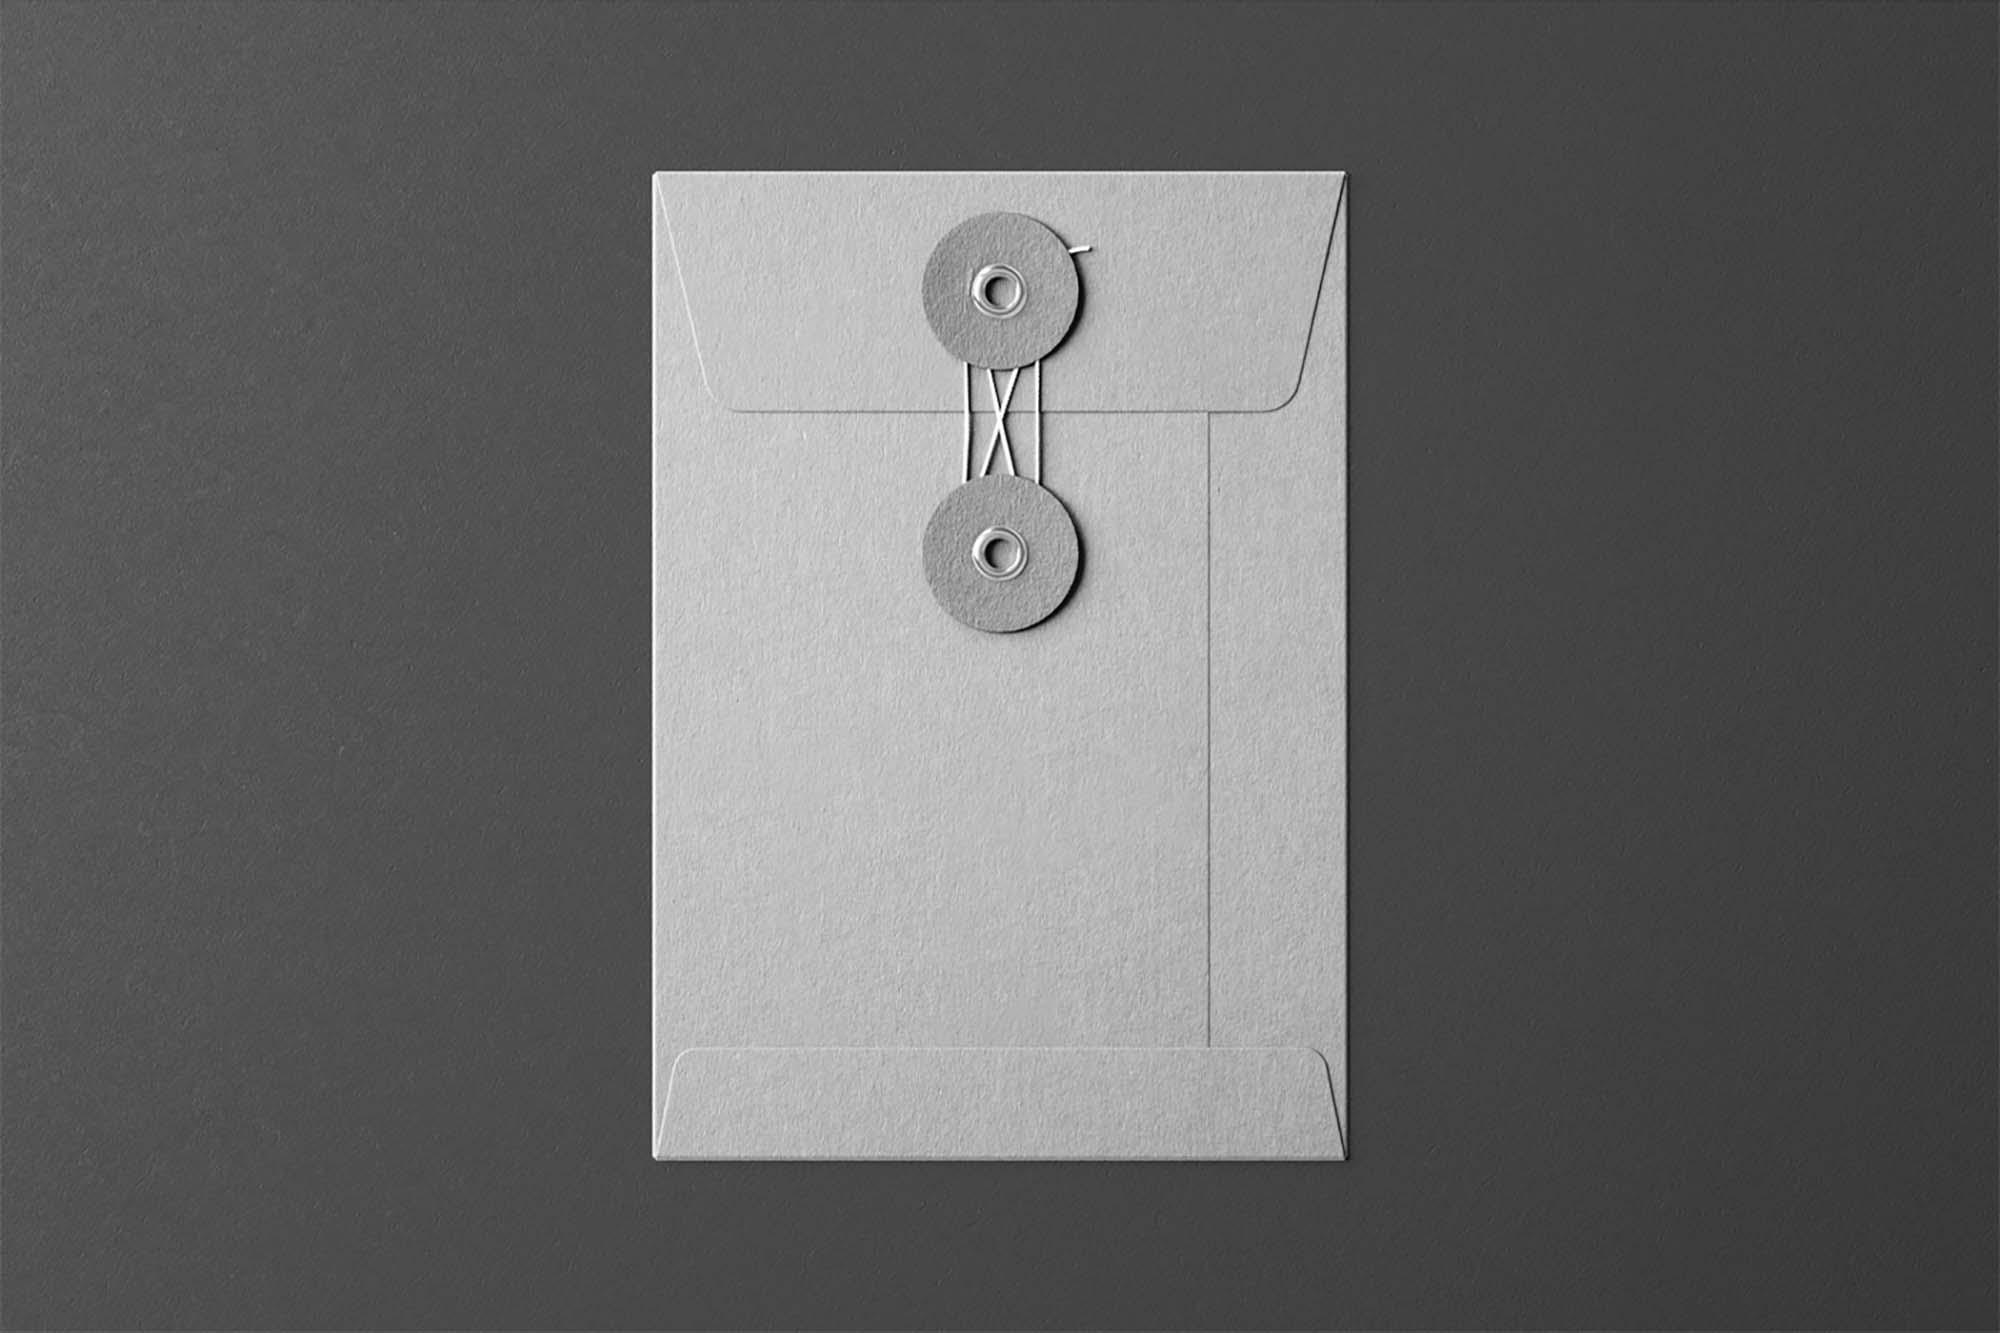 Small String Envelope Mockup 2